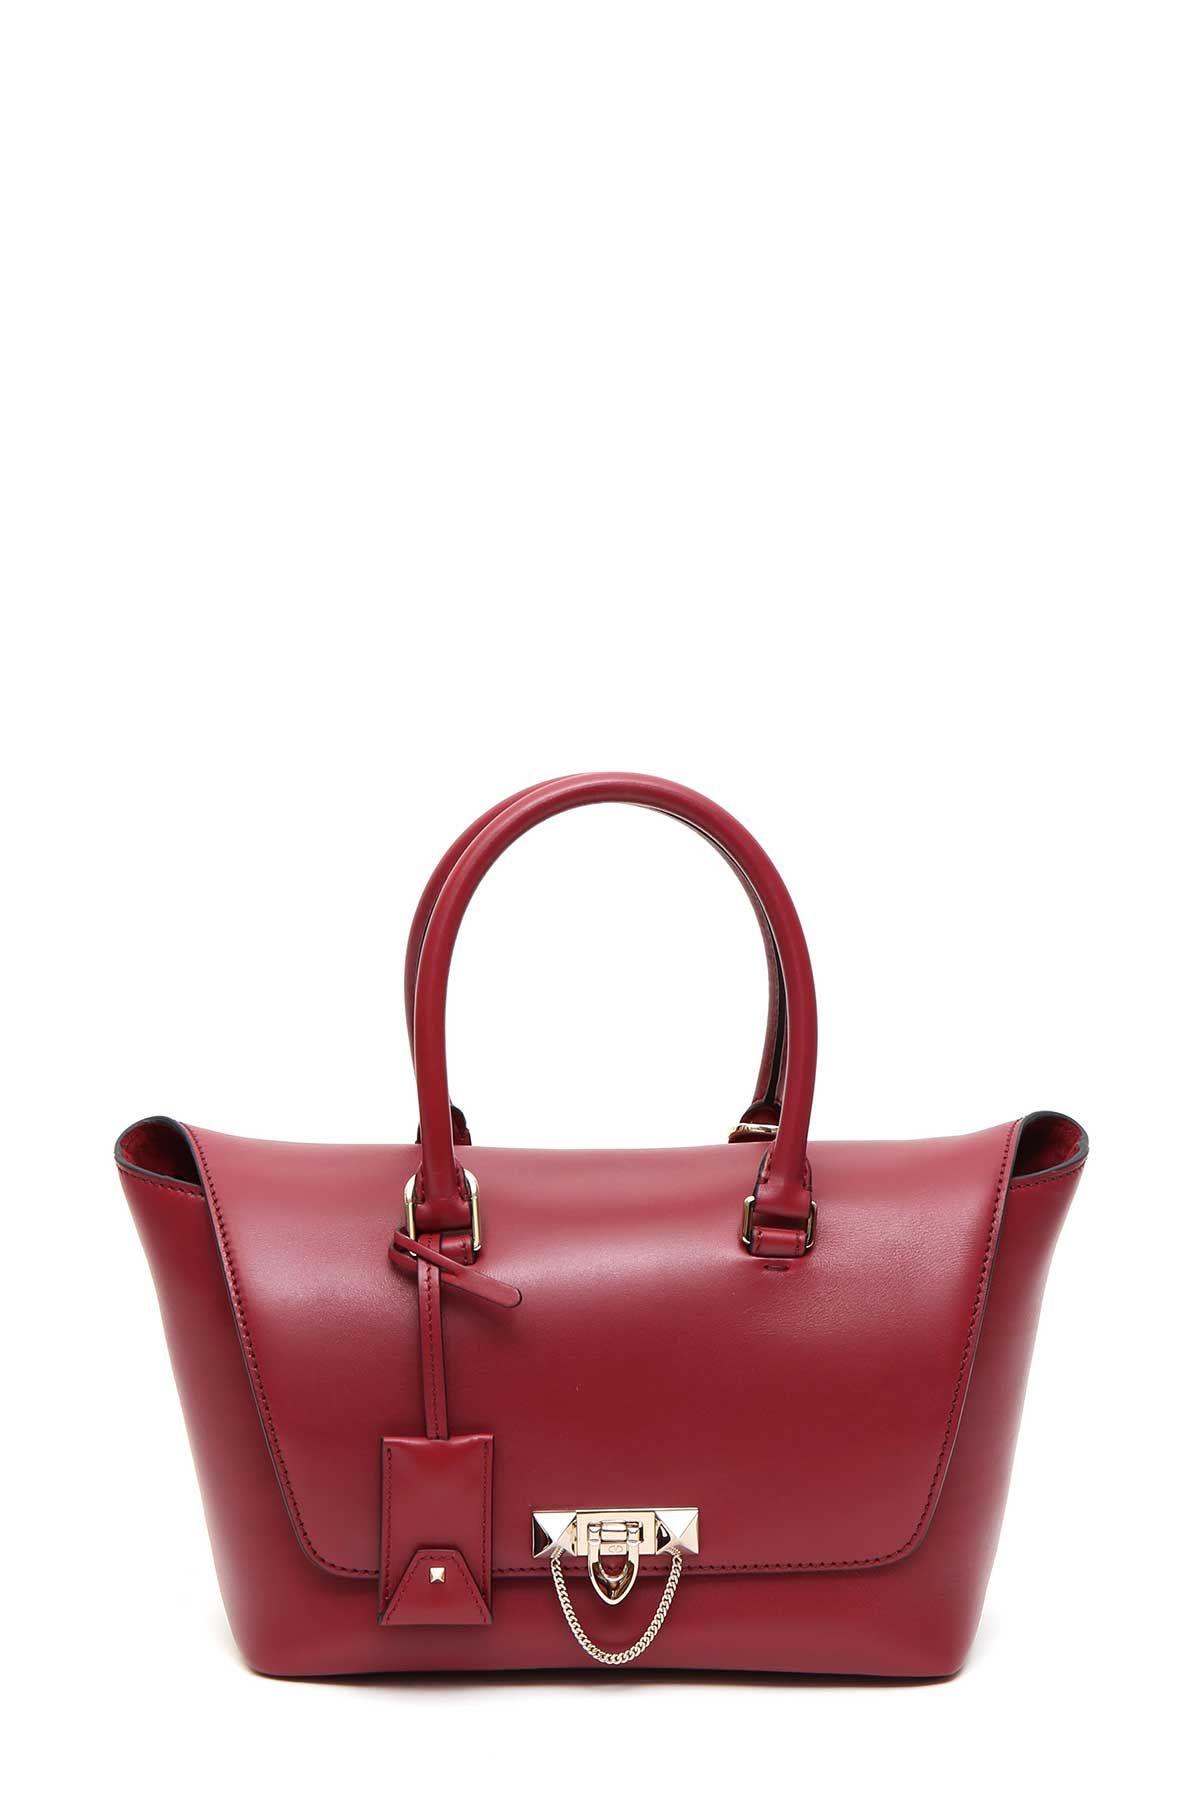 Valentino Garavani Small Demilune Handbag